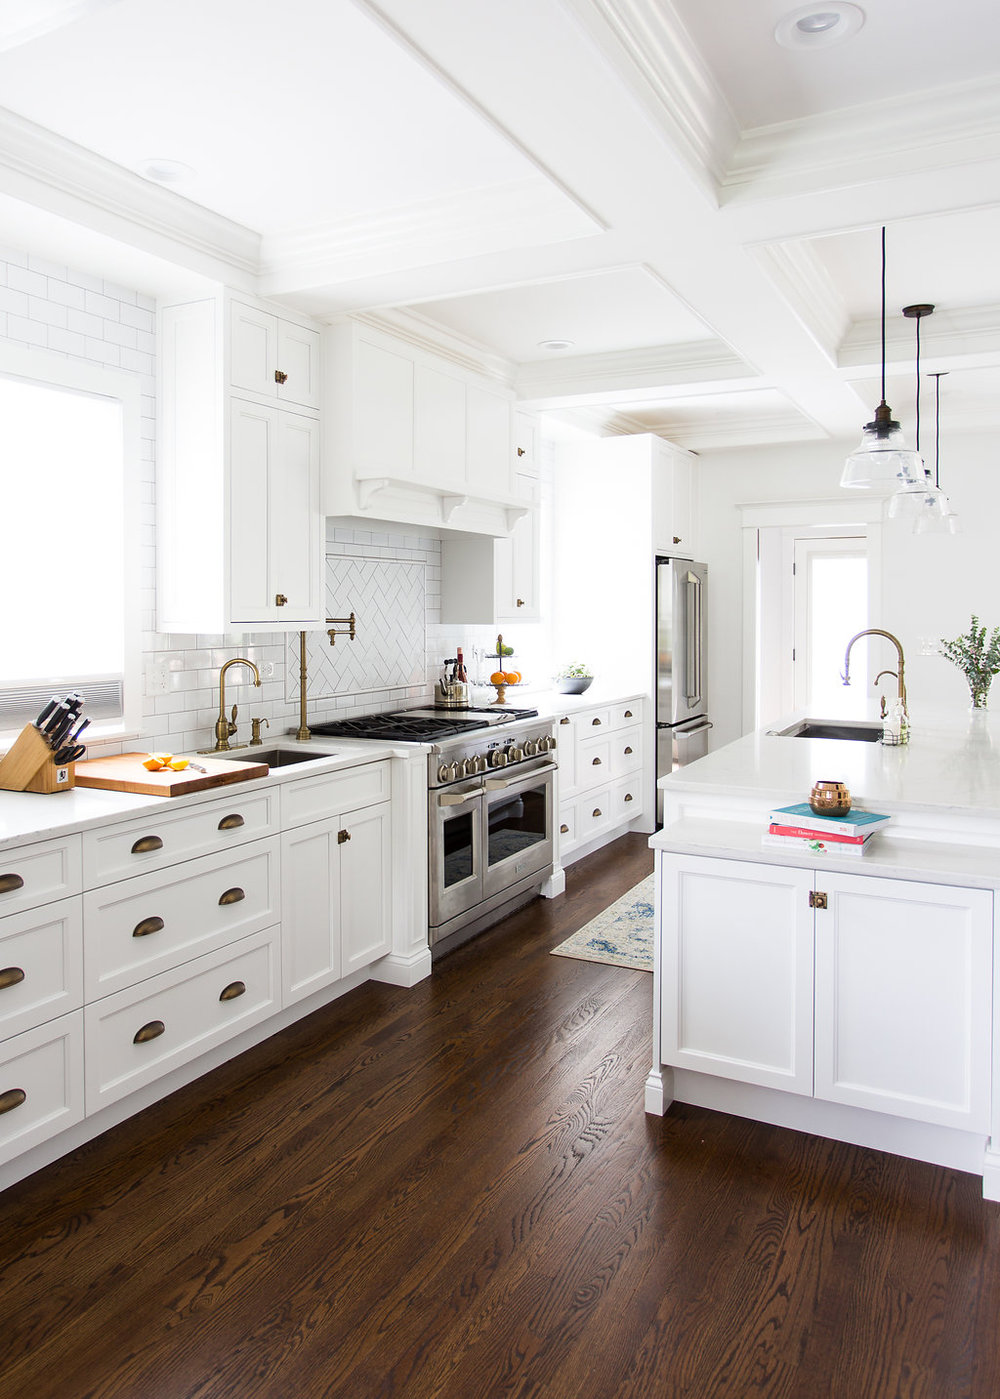 ember-cmr-kitchen-5117a.jpg